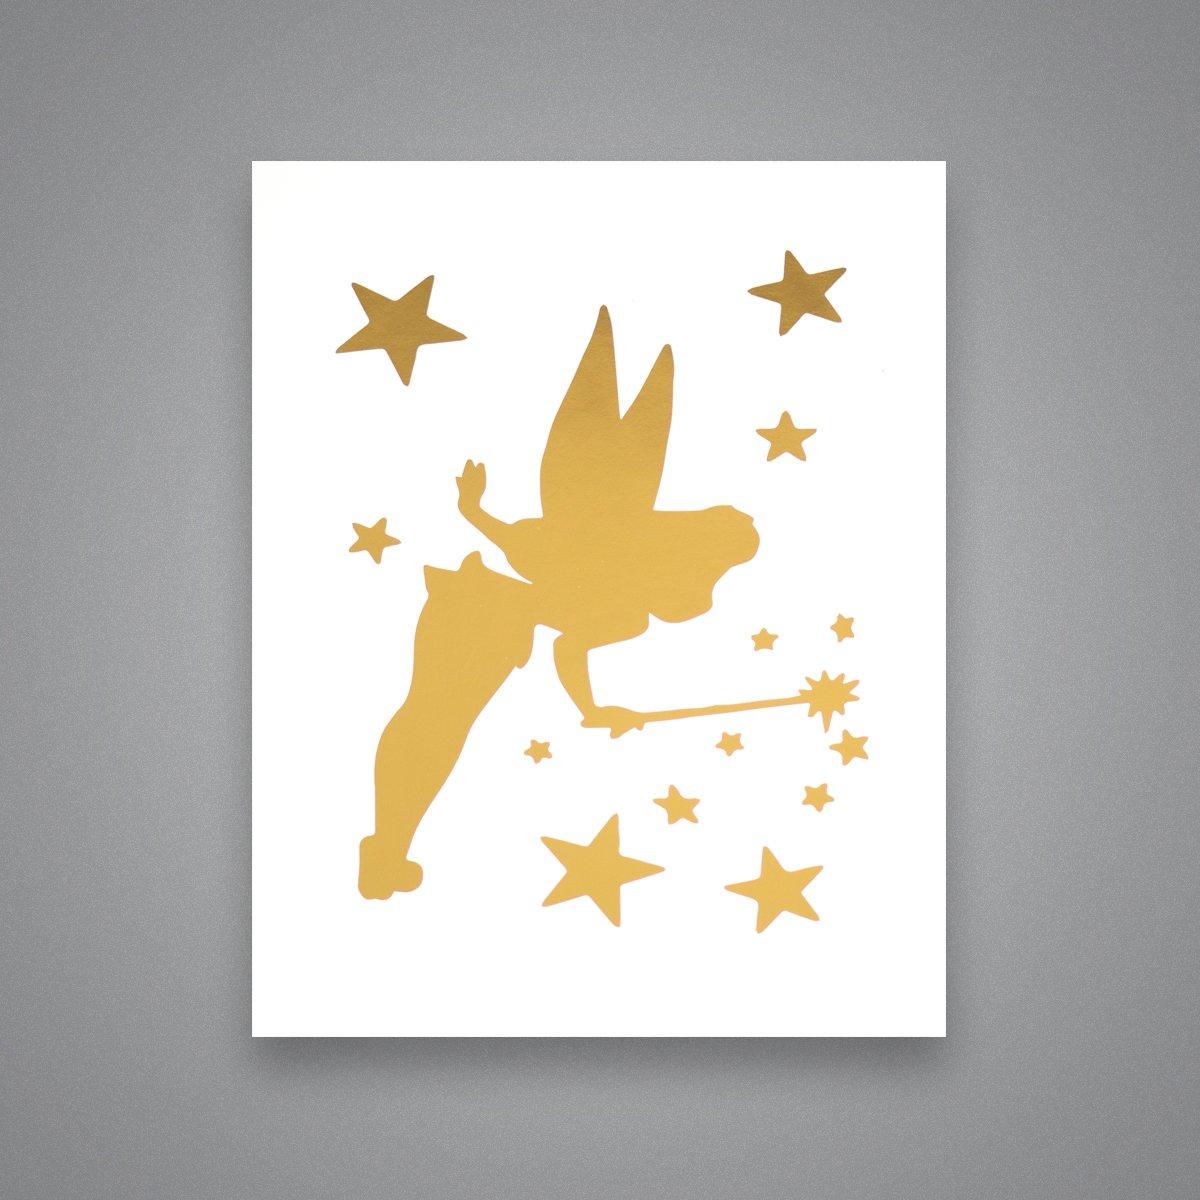 Amazon.com: Tinkerbell Silhouette - Gold Foil Art Print ...